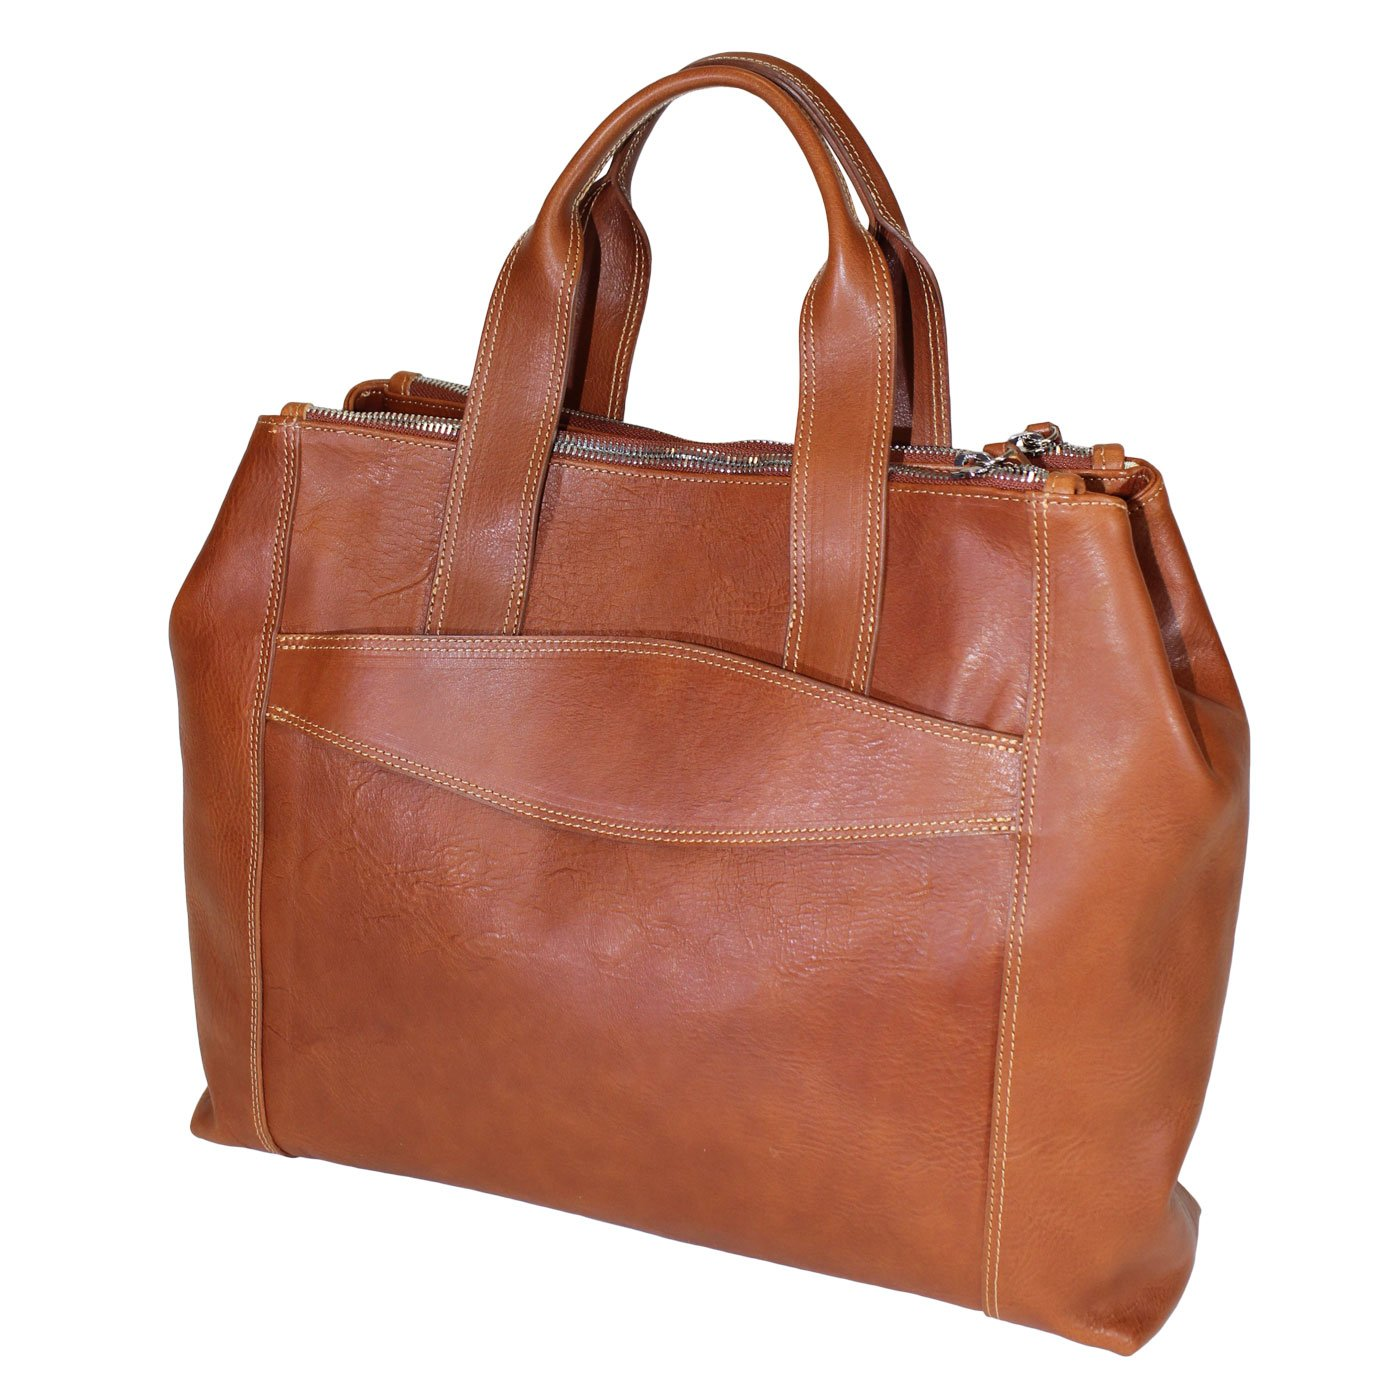 82afee21365 Terrida Marco Polo handbag - LE1122 (Cuoio): Amazon.co.uk: Luggage